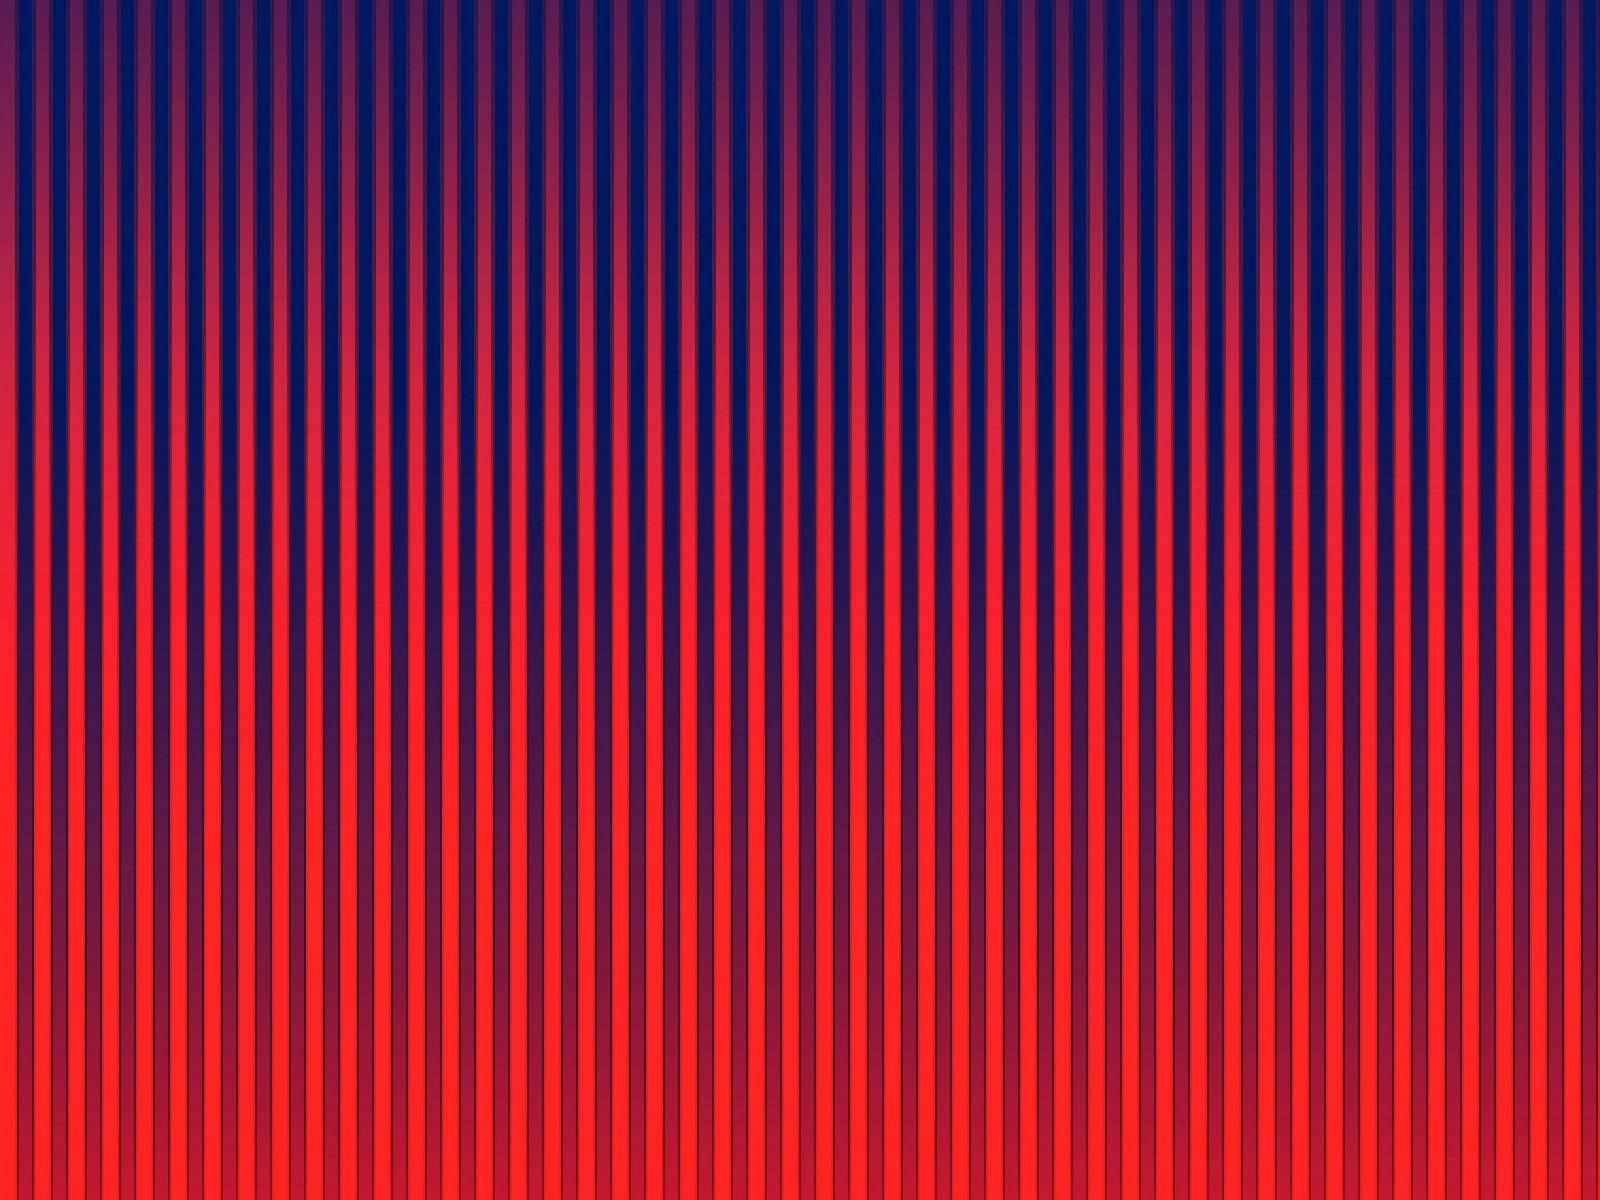 Blue Stripe Wallpaper: Navy Blue Stripe Wallpaper